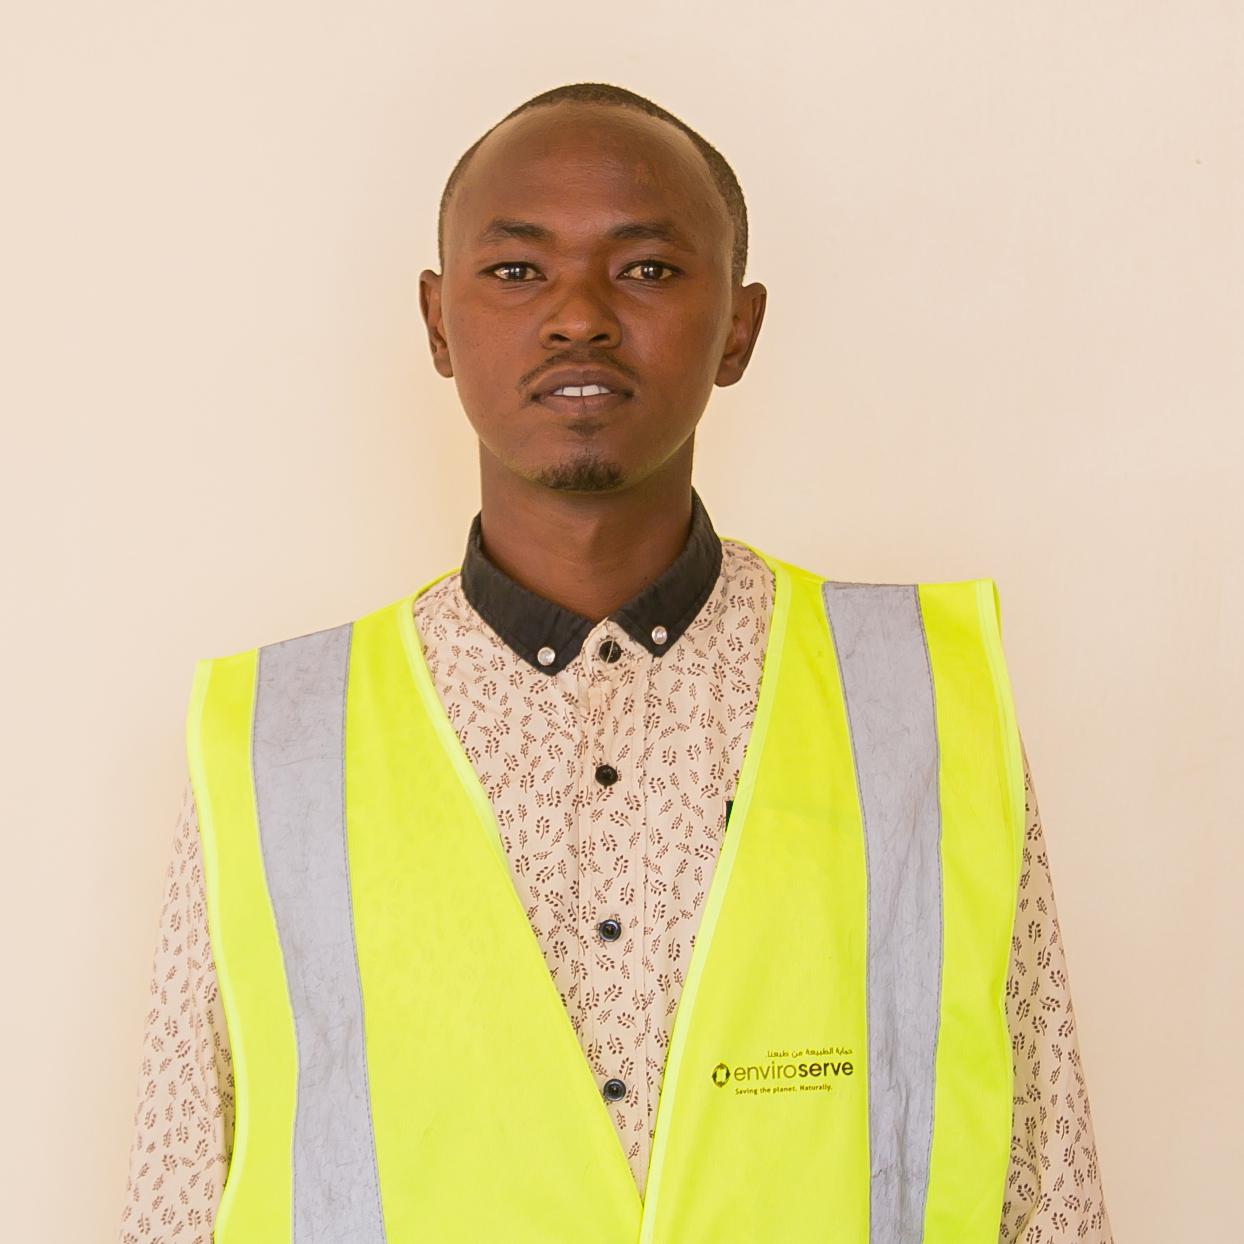 Emmanuel Biziyaremye